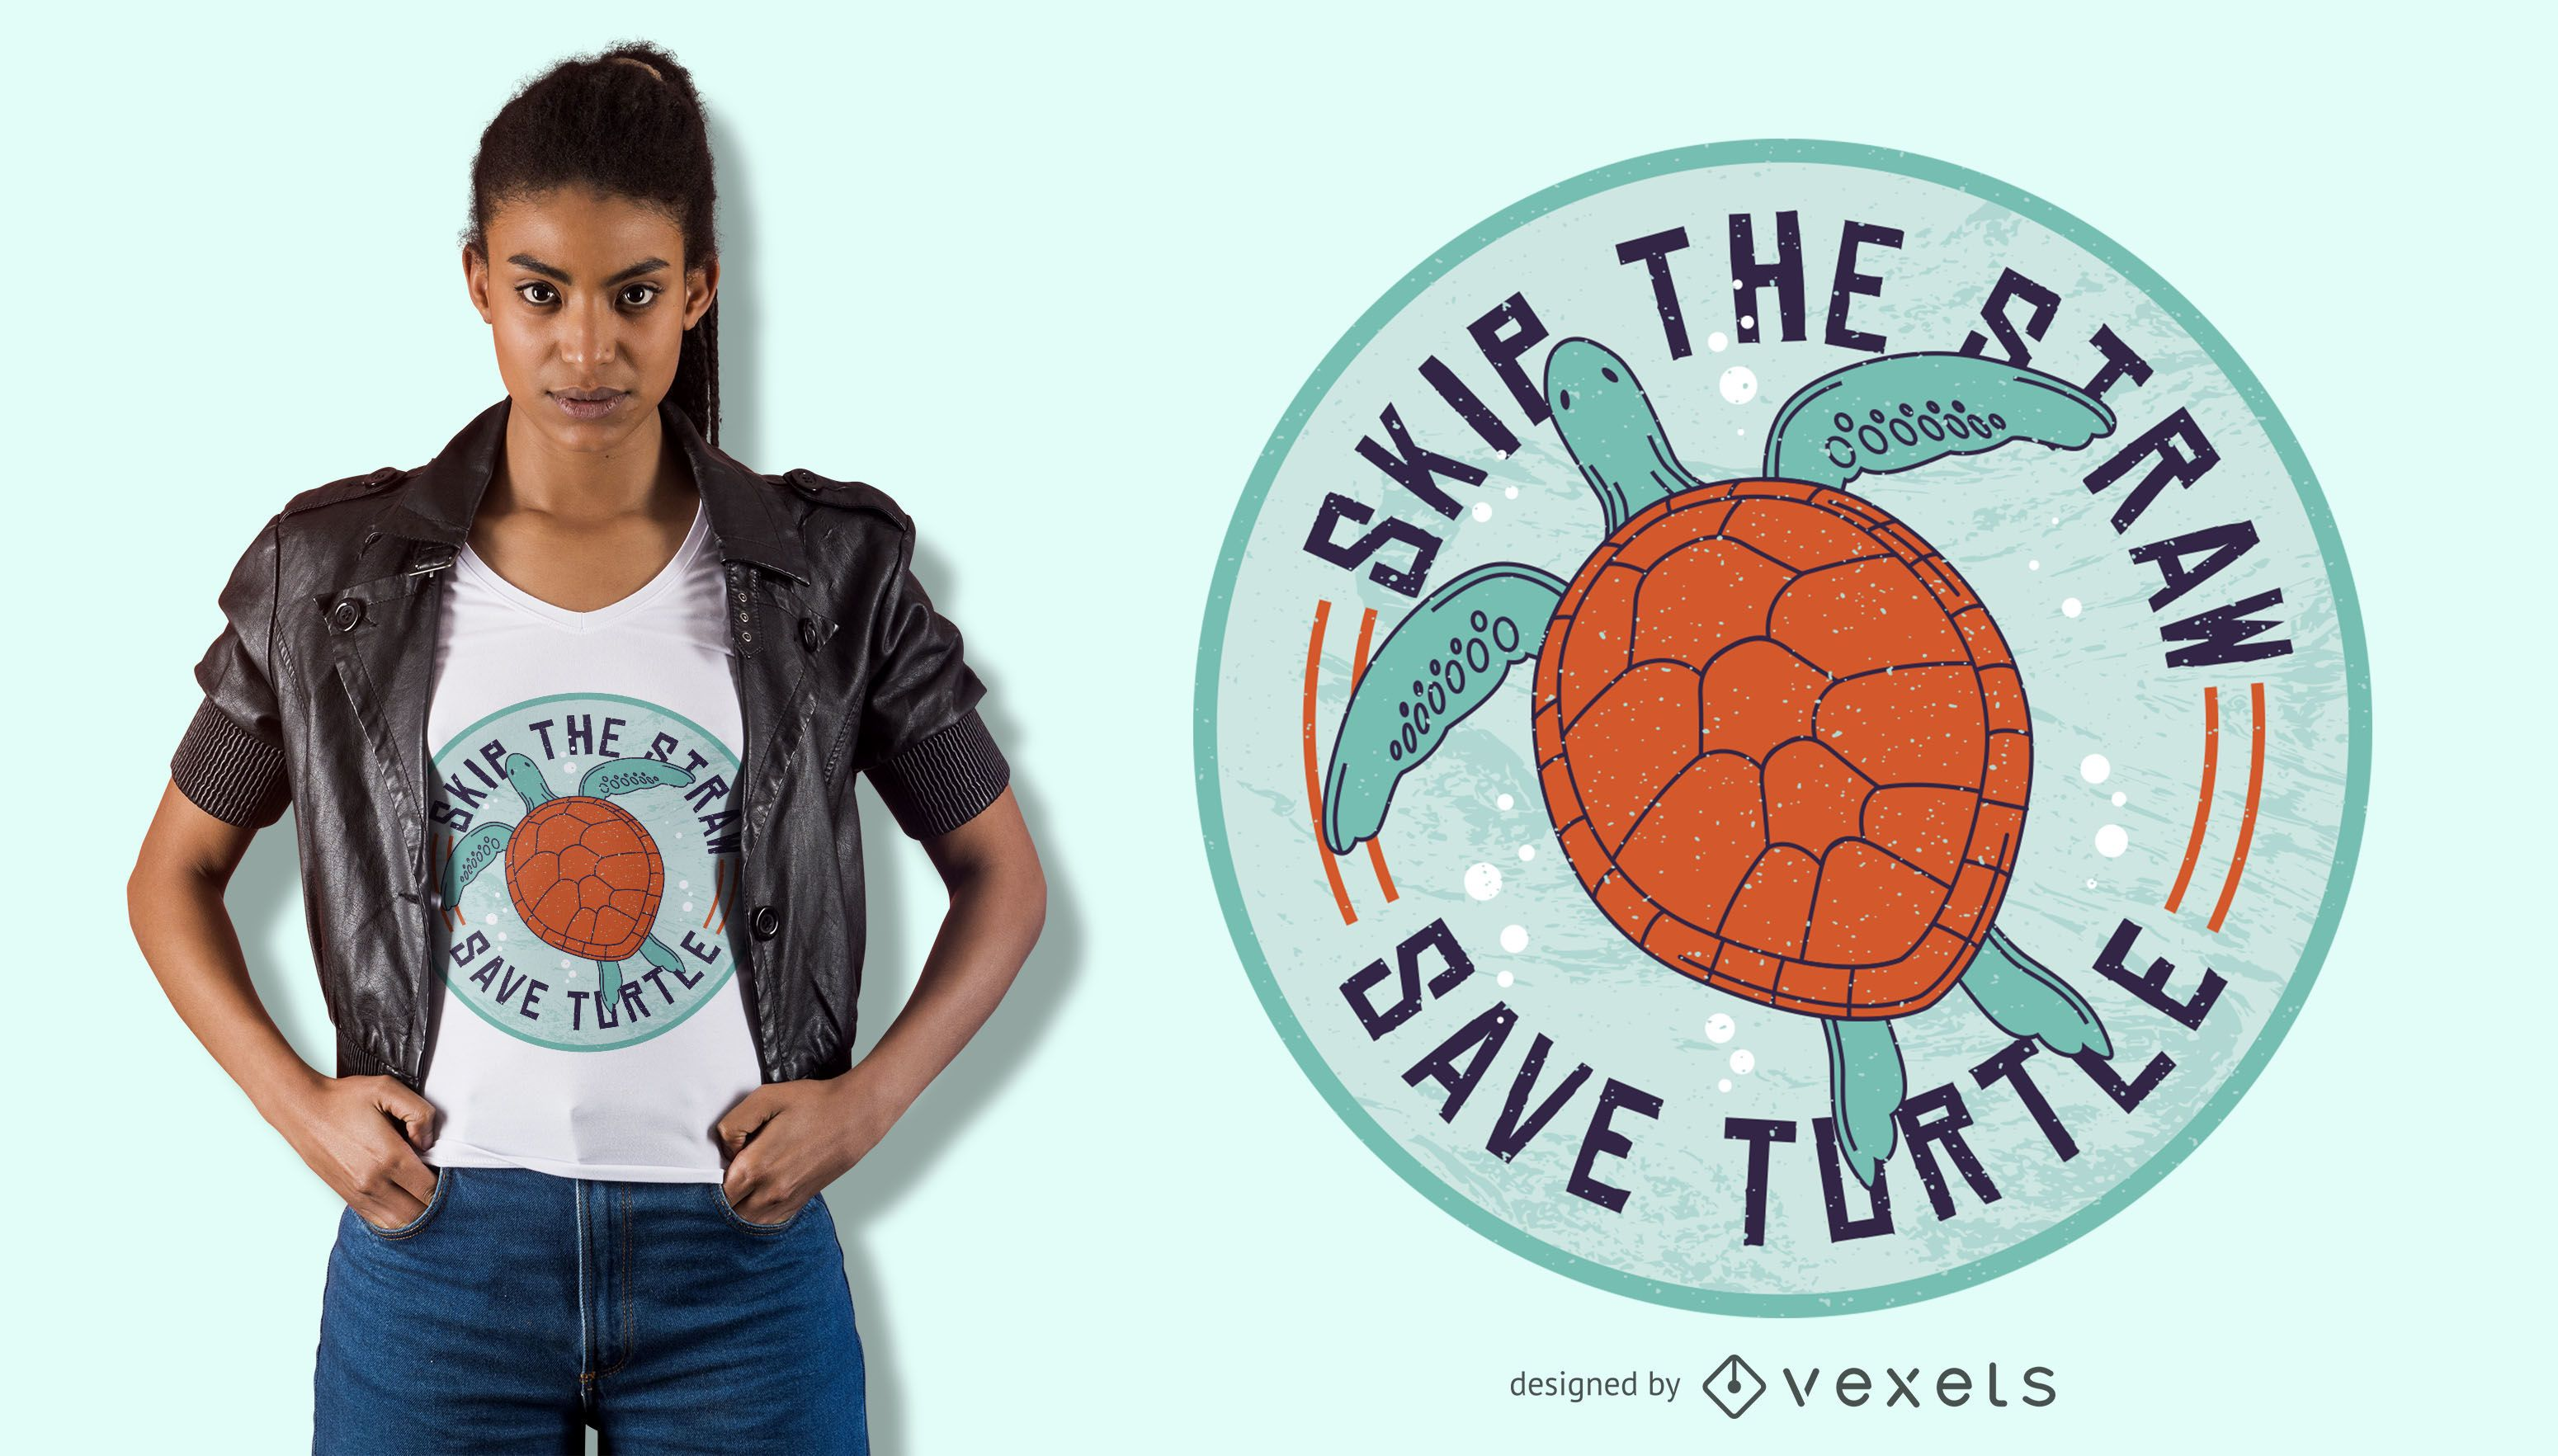 Save Sea Turtles T-shirt Design